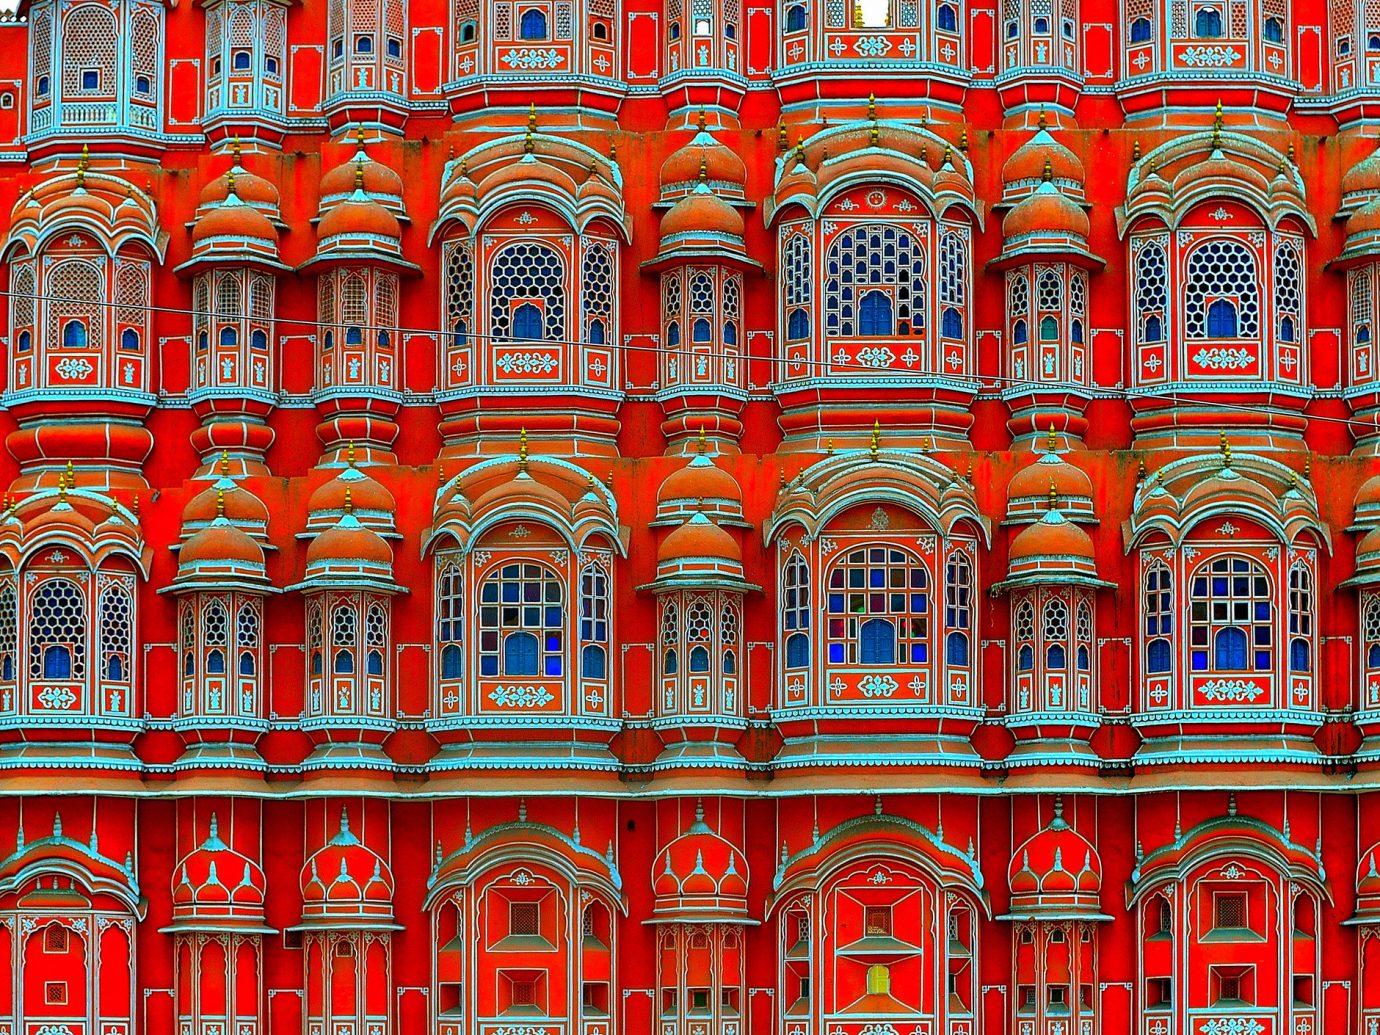 Travel Tips Trip Ideas red facade pattern Design window symmetry metropolis palace